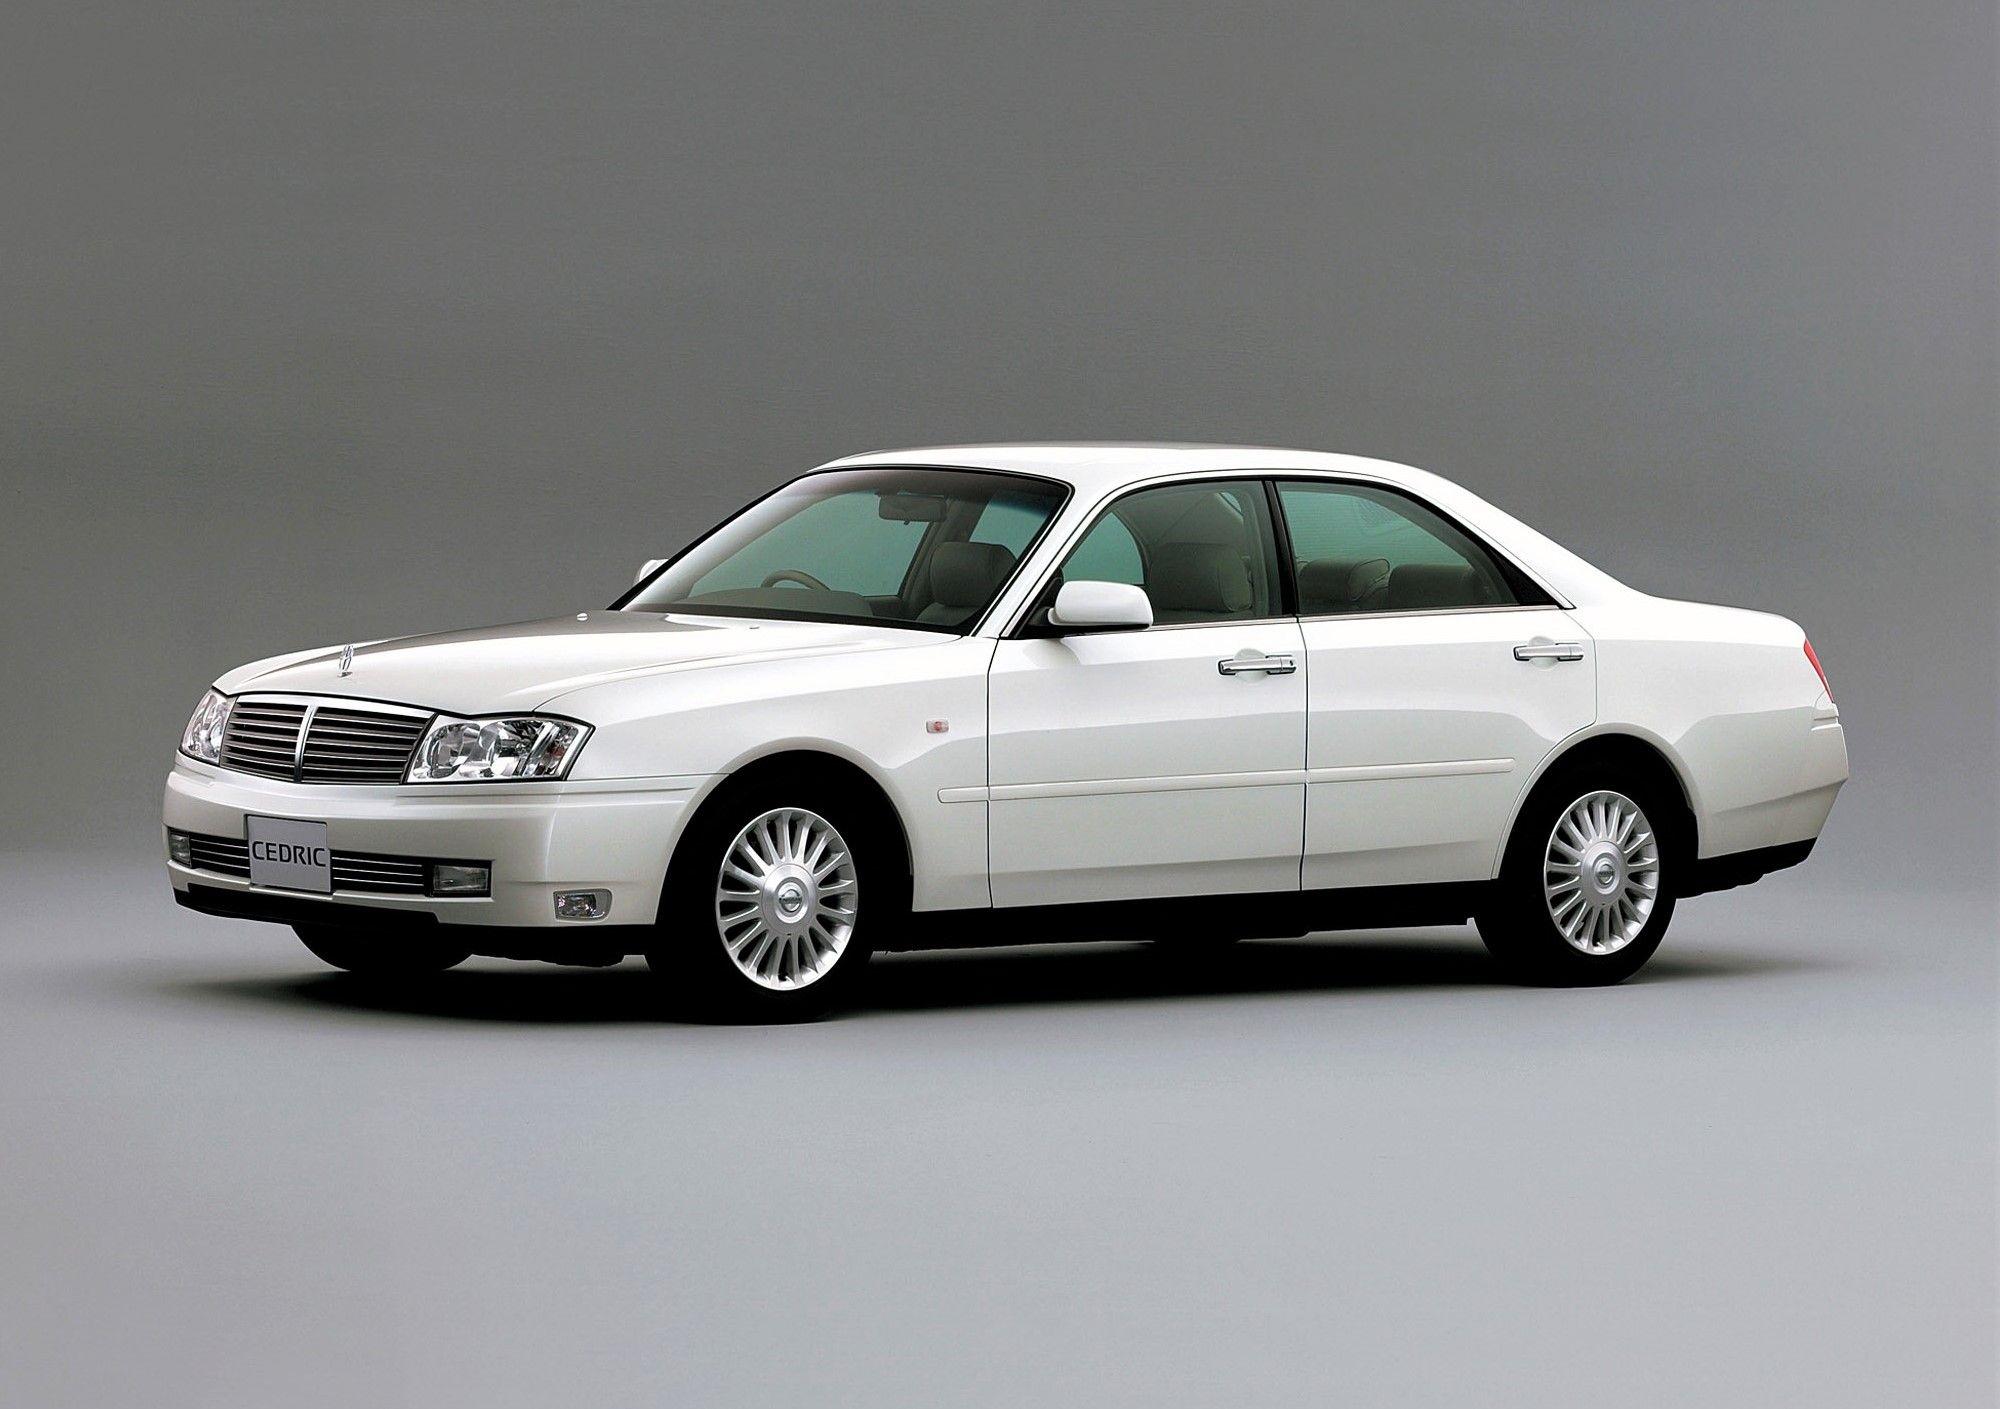 1999 nissan cedric 2003 2004 infiniti m45 car design pinterest rh pinterest com Nissan Y33 Y33 Q45 Slammed